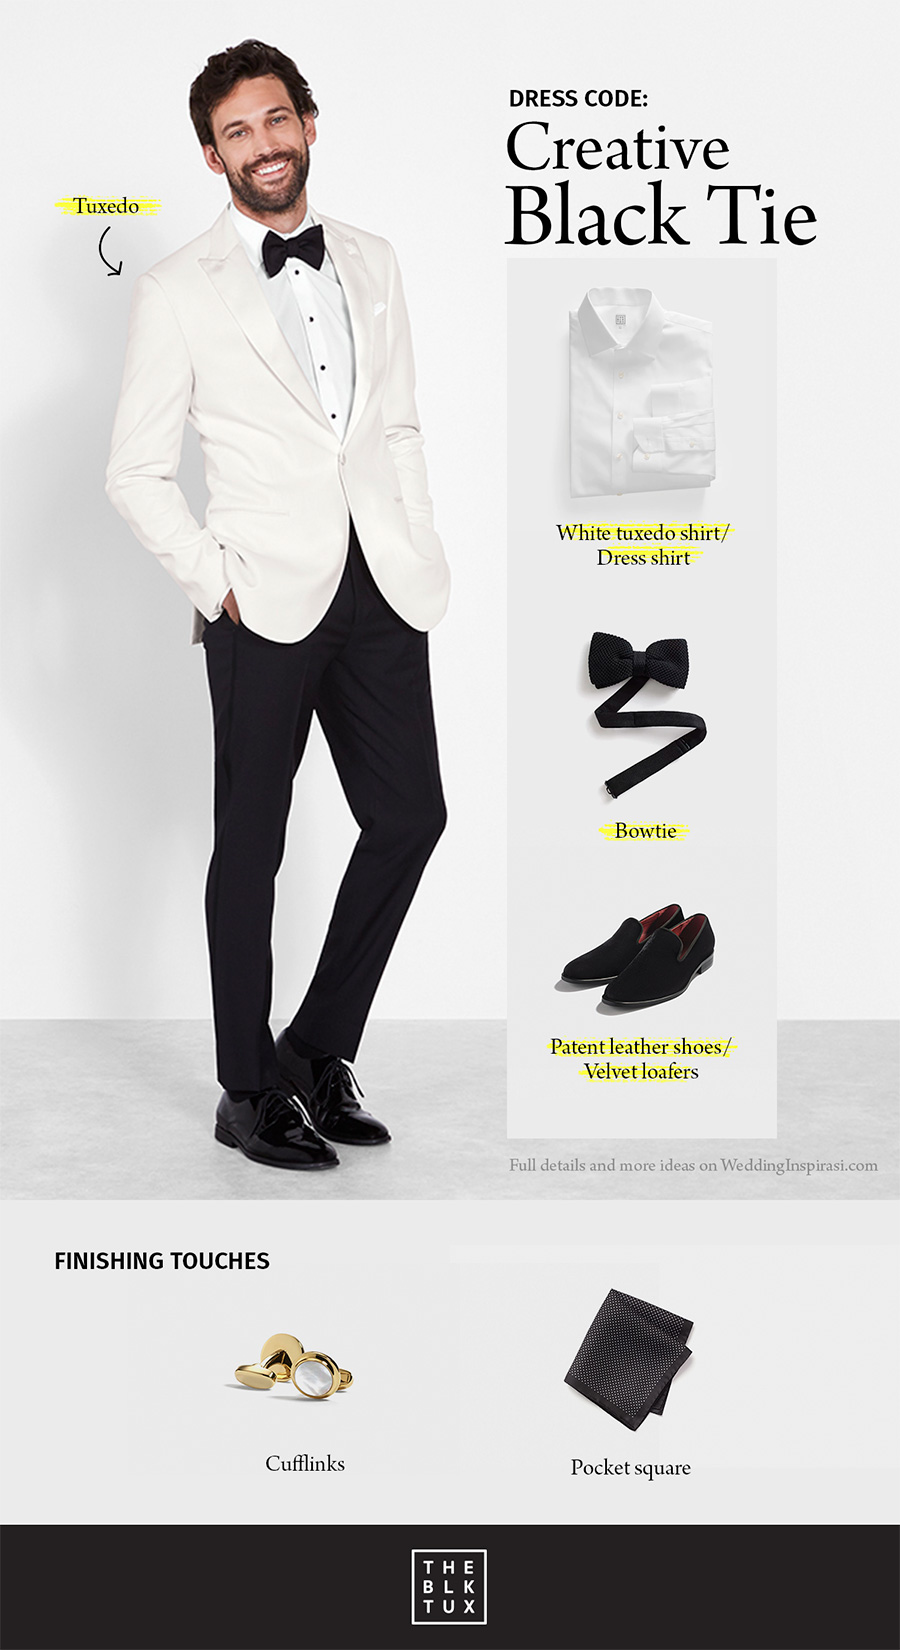 18b3a9548dc the black tux wedding dress code creative black tie modern style suit  tuxedo rental service